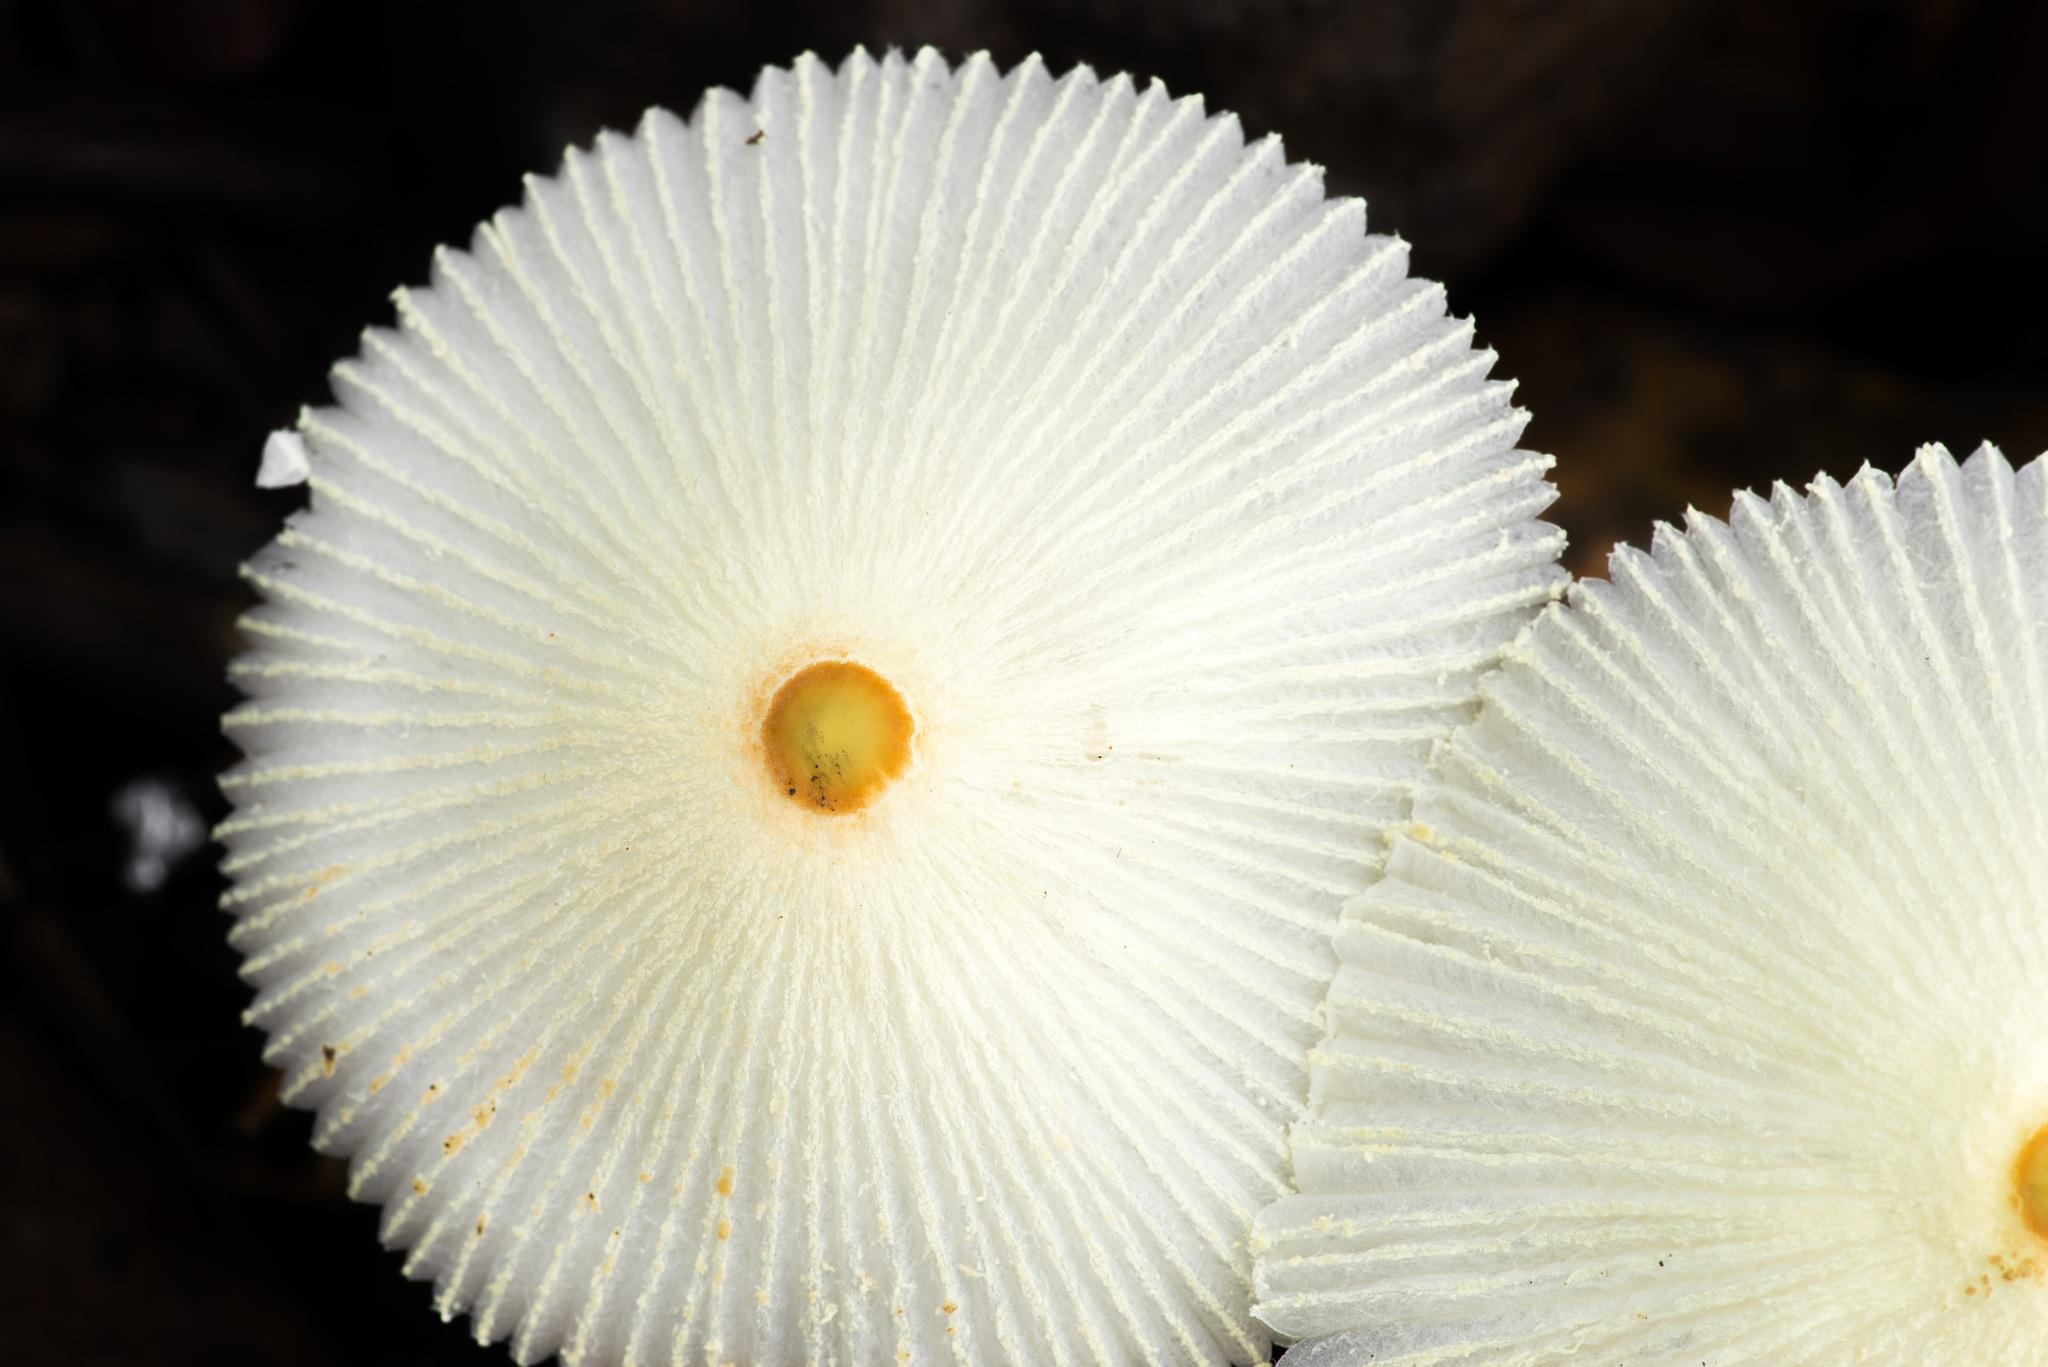 White Mushroom by JaribFoto